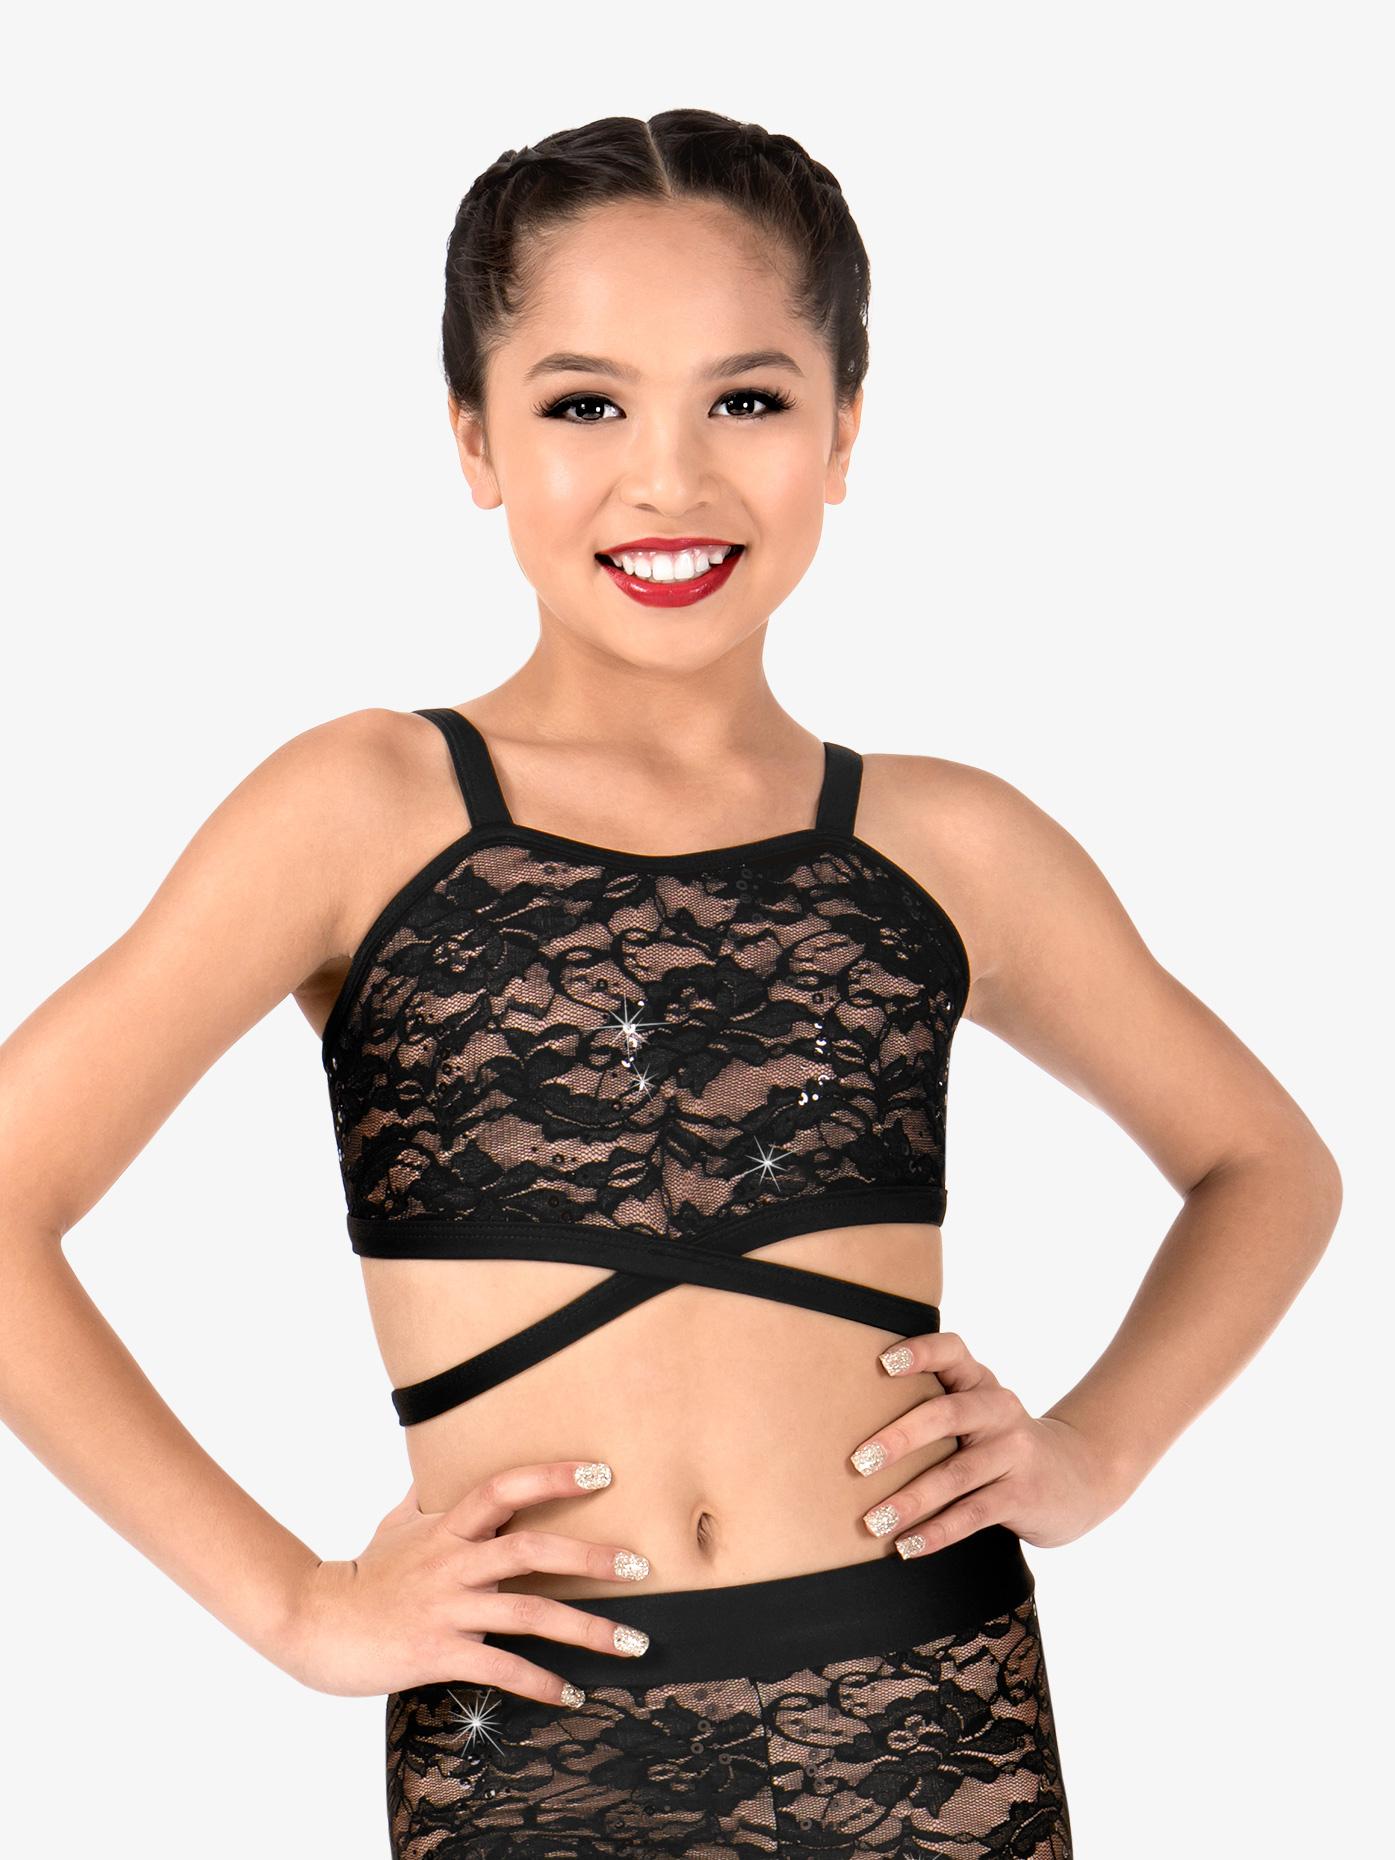 Elisse by Double Platinum Girls Crisscross Camisole Dance Bra Top N7488C